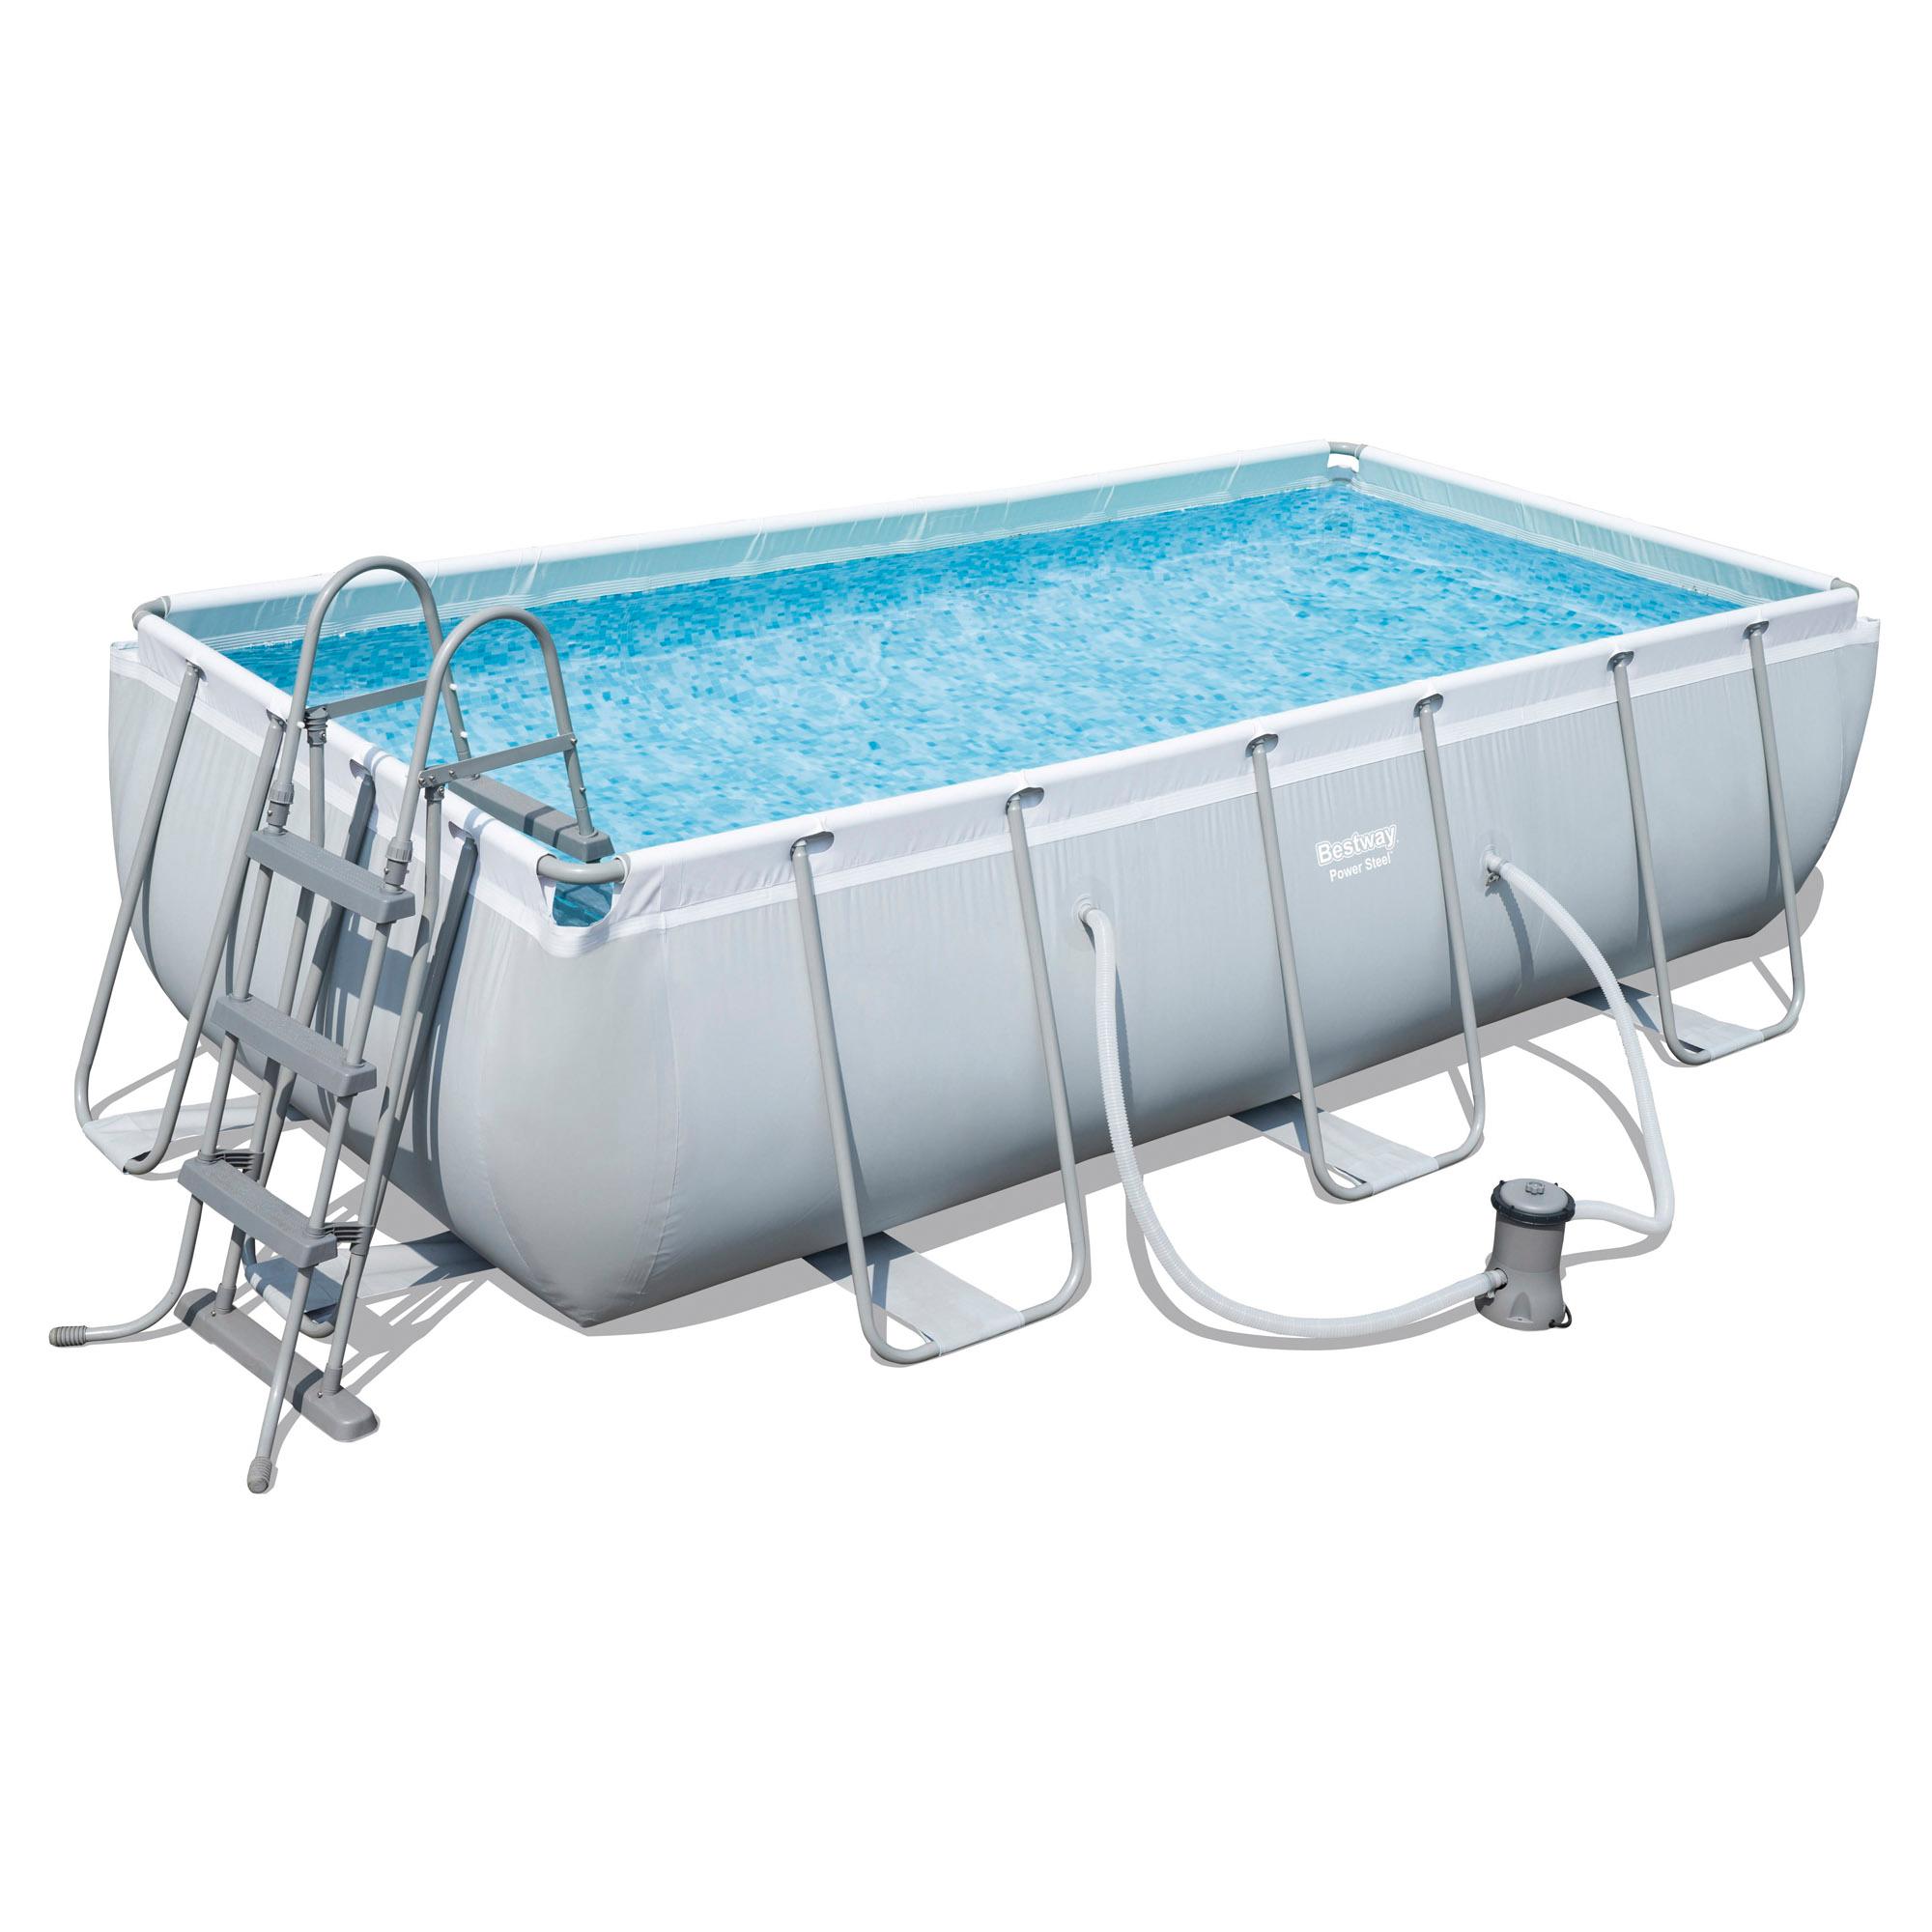 "frame-pool ""power steel"" rechteckig 404 x 201 x 100 cm ǀ toom baumarkt"